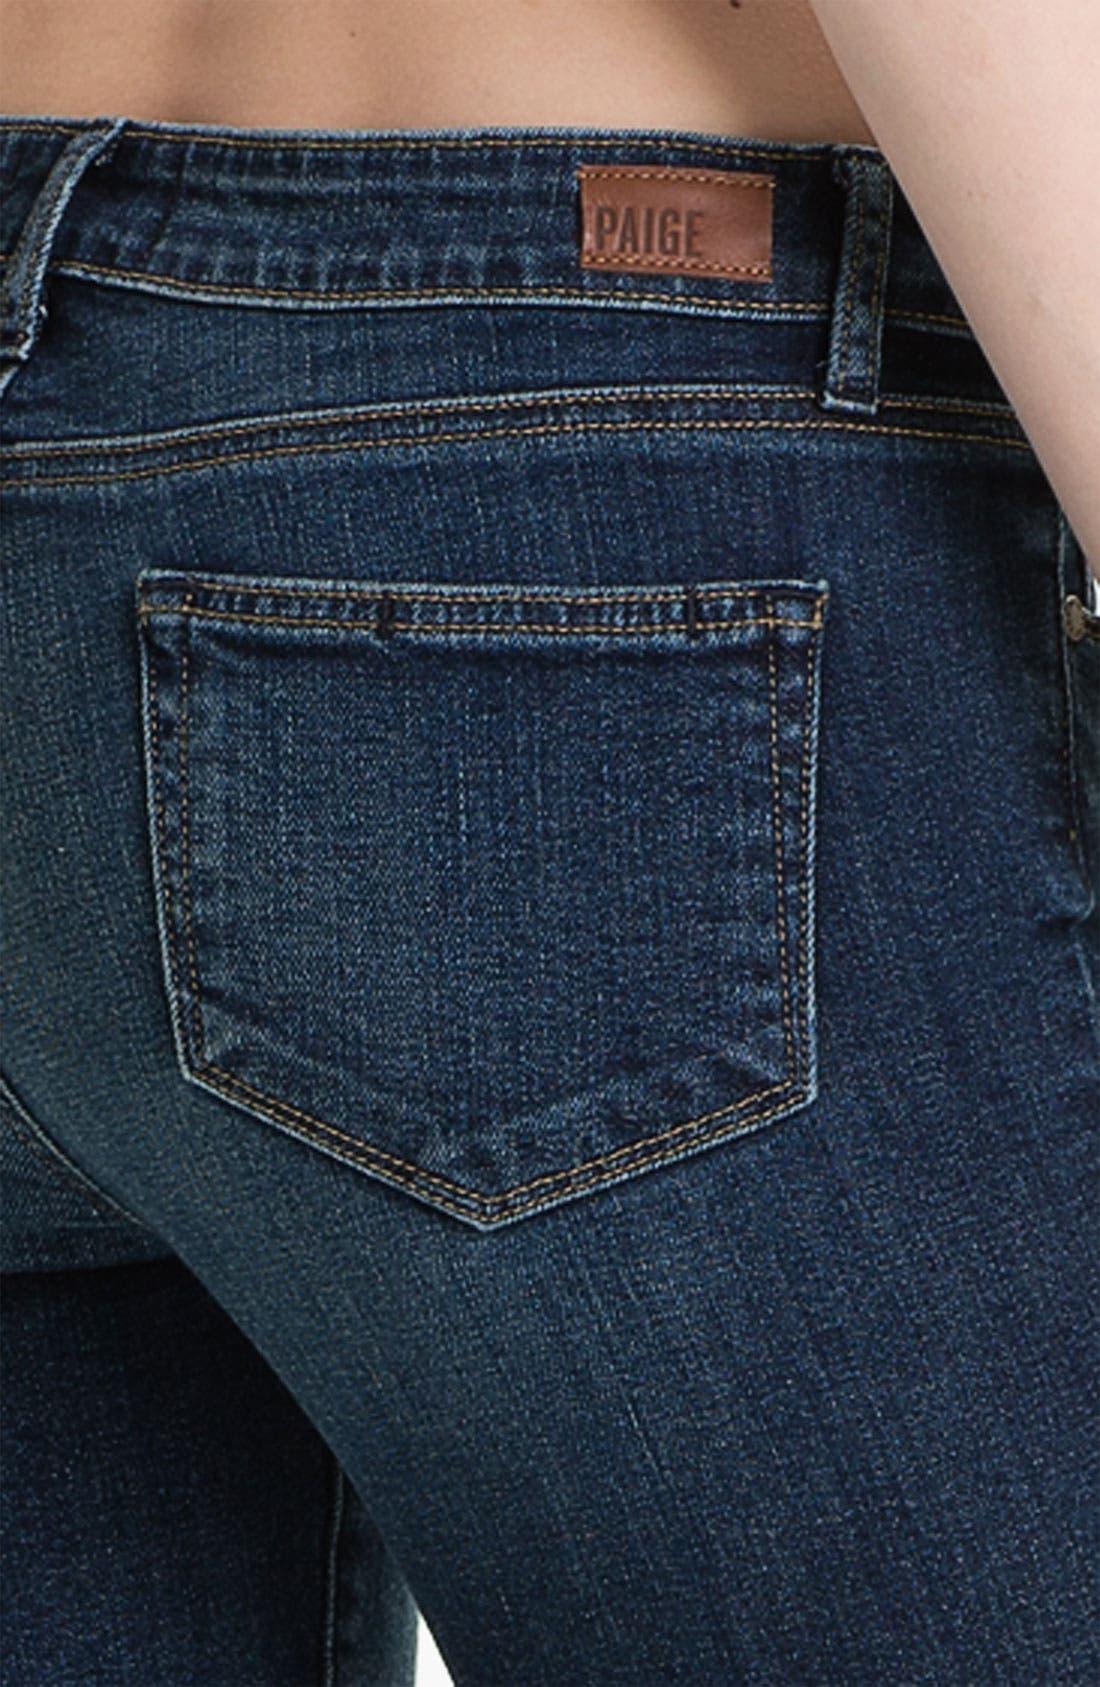 Alternate Image 3  - Paige Denim 'Verdugo' Stretch Denim Skinny Jeans (Benny)